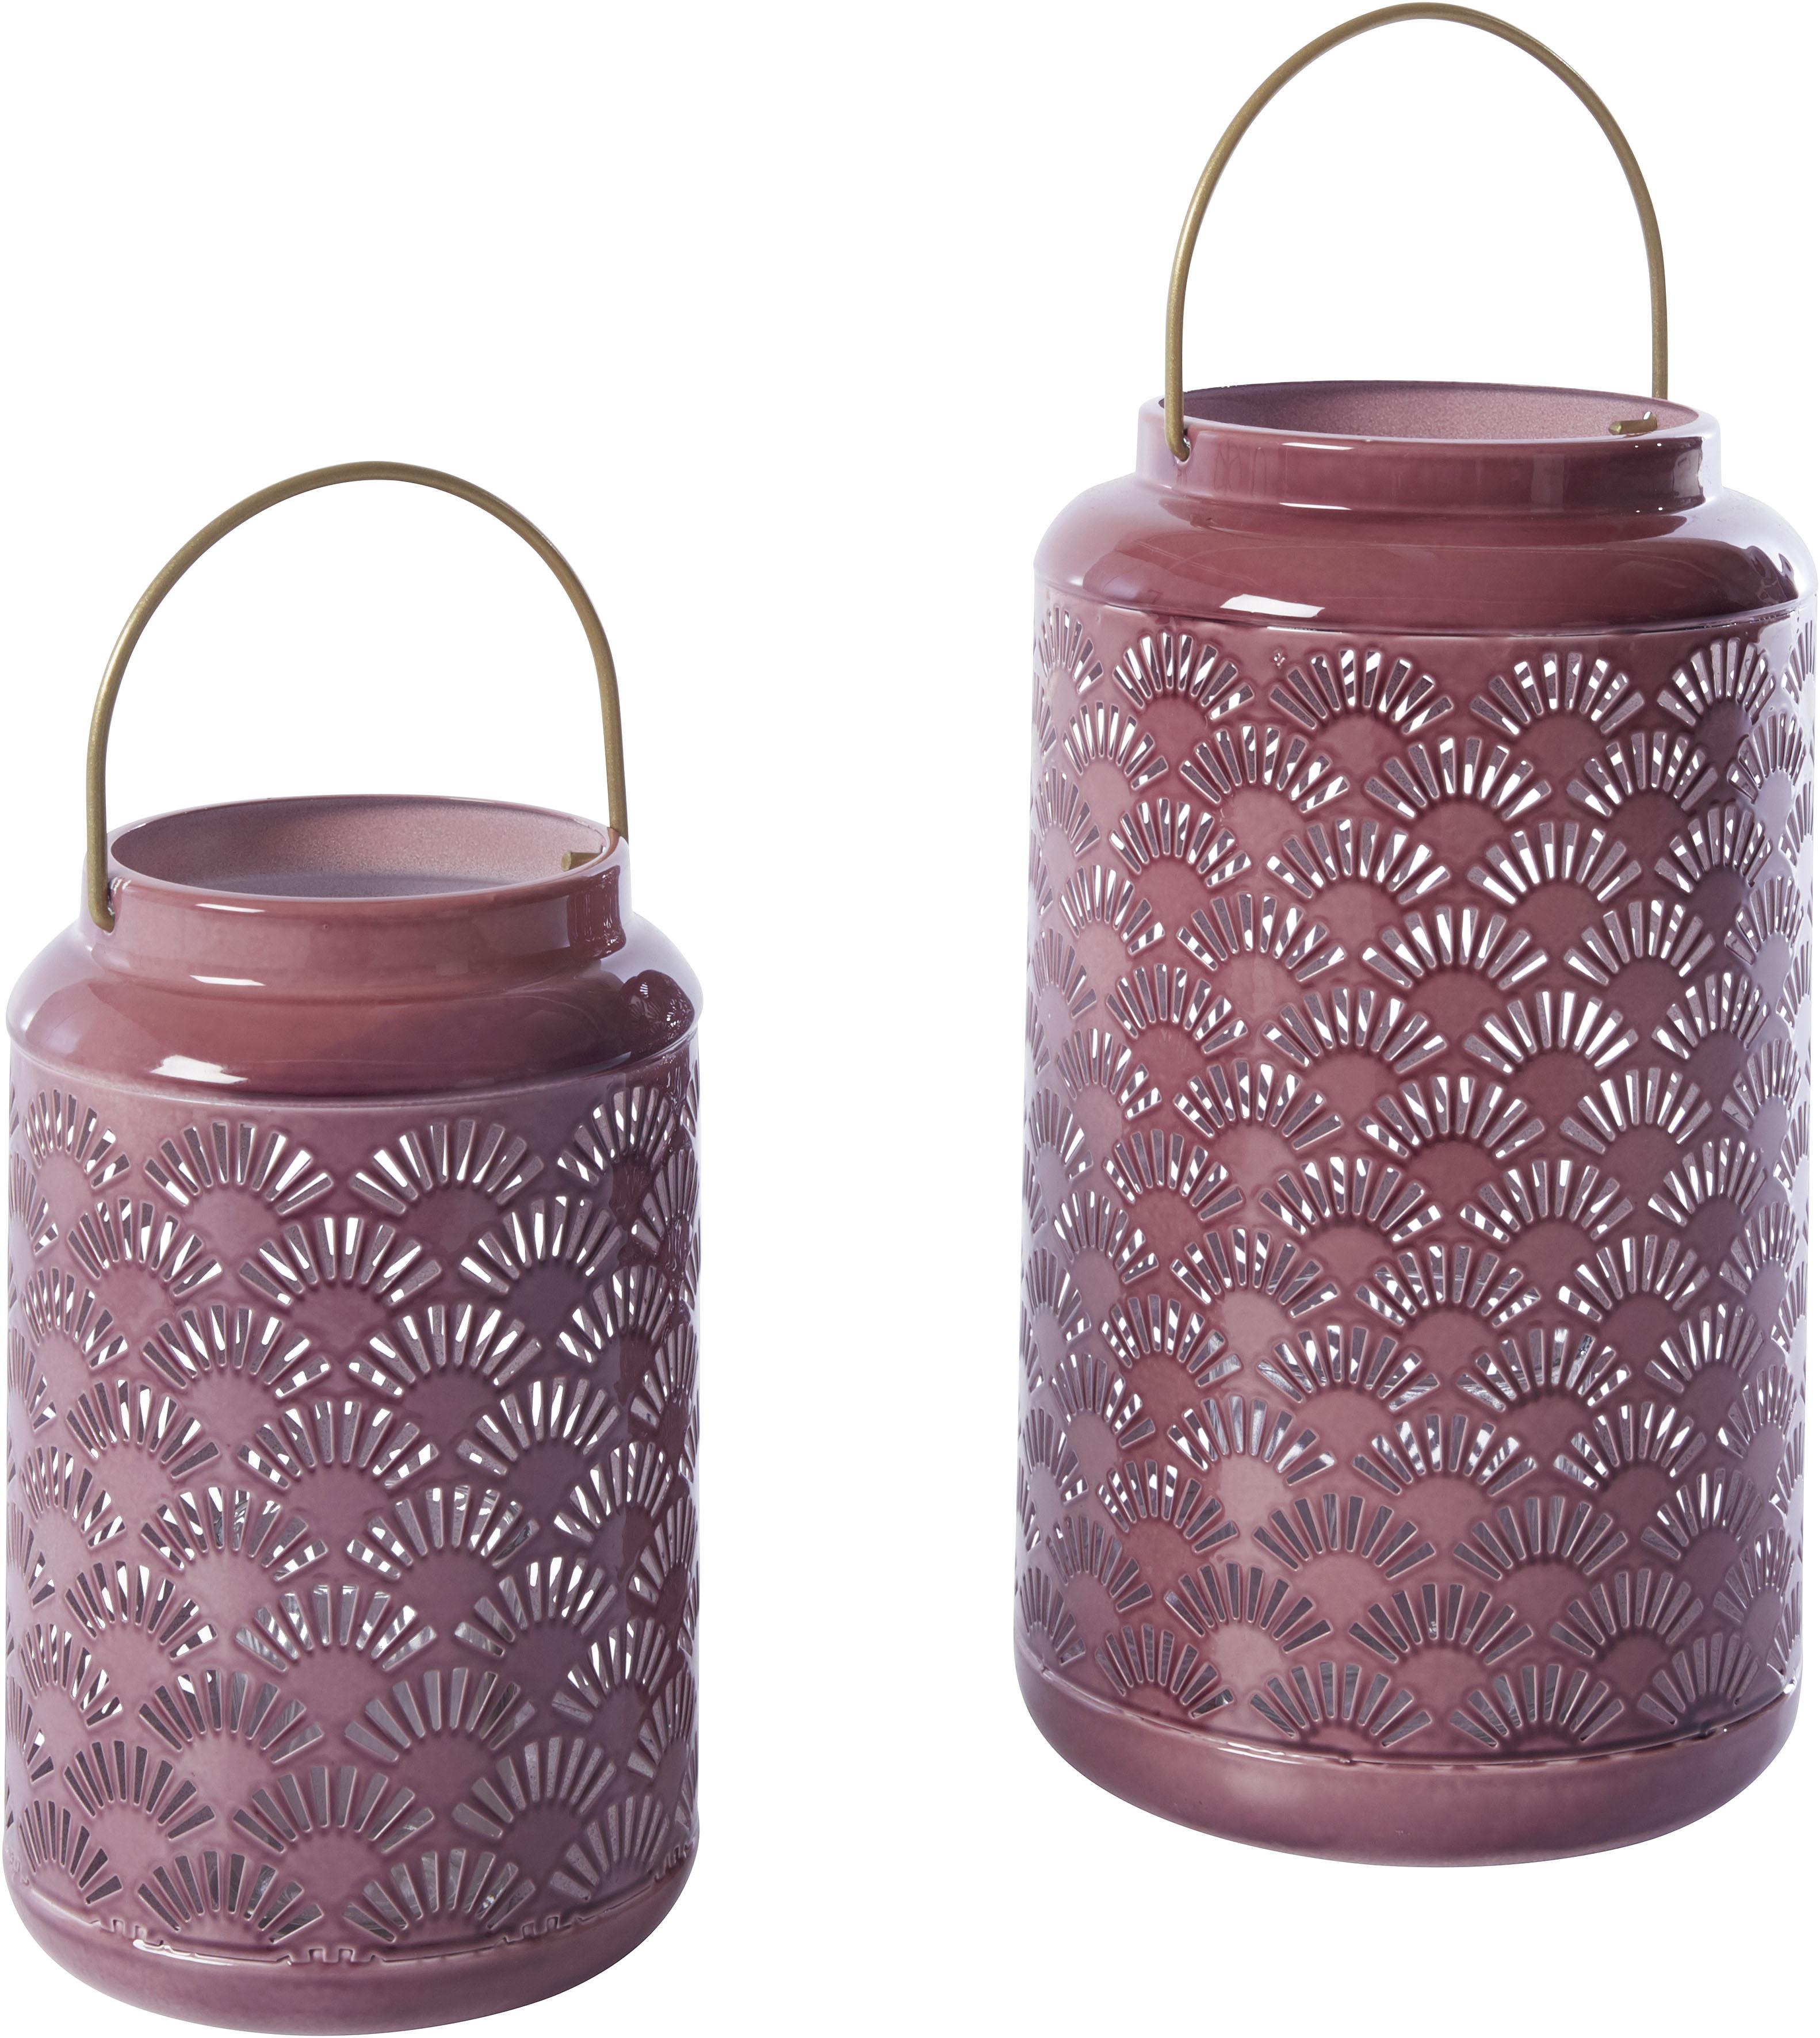 INOSIGN Kerzenlaterne lila Kerzenhalter Kerzen Laternen Wohnaccessoires